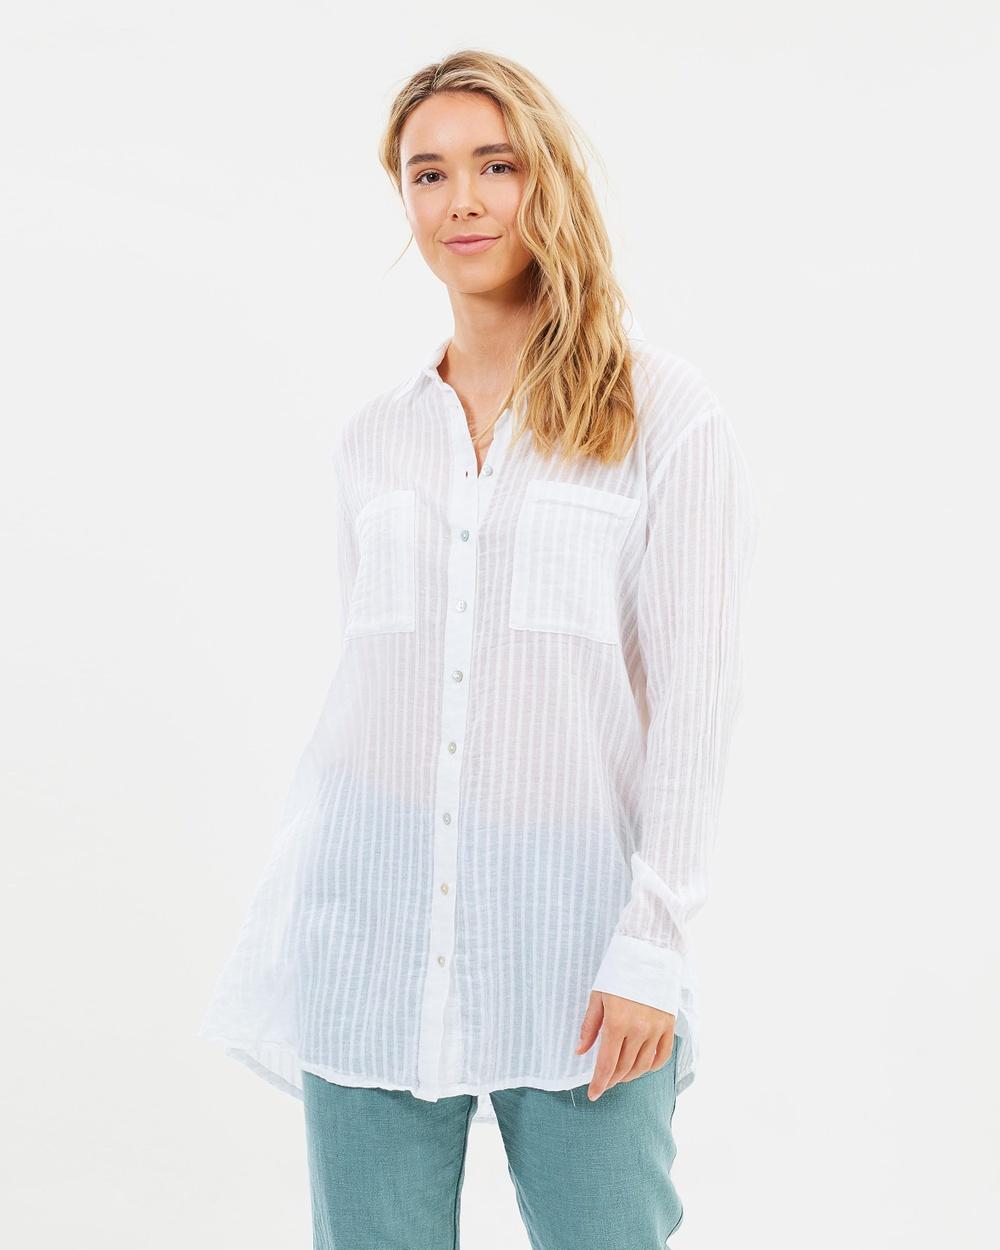 Rusty Sabrina Beach Shirt Swimwear White Sabrina Beach Shirt